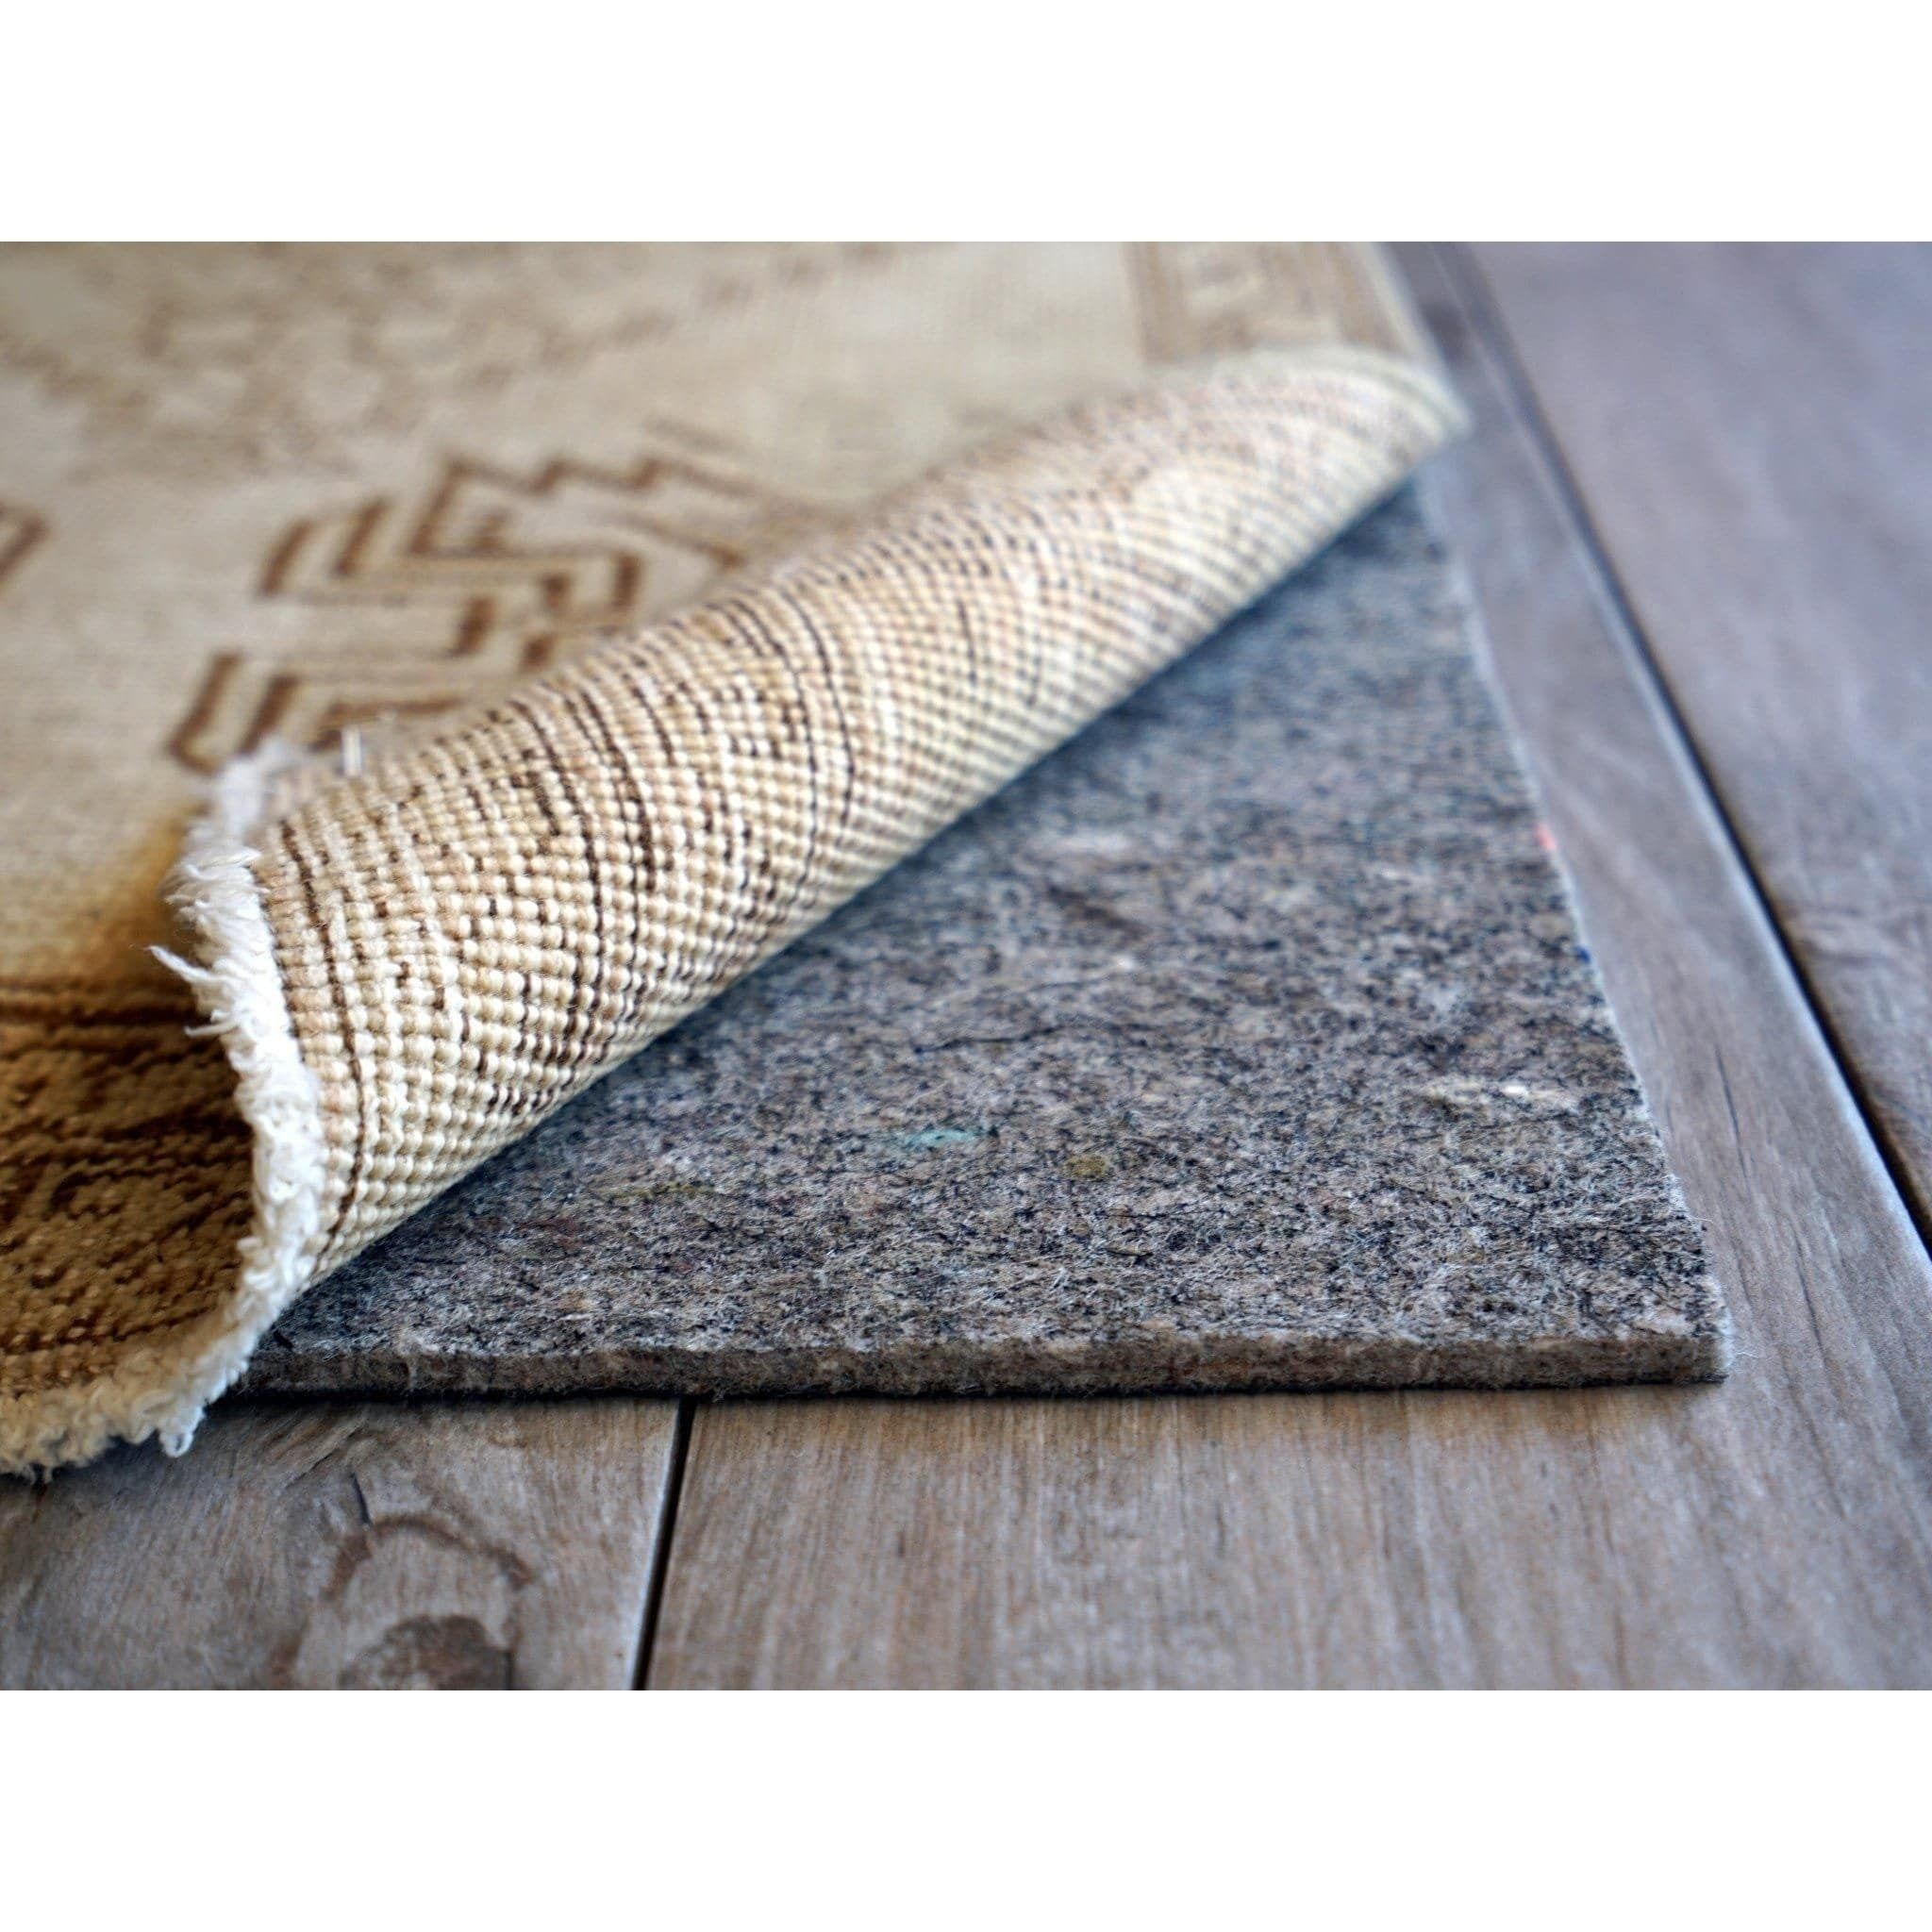 Cushgrip 1 8 Inch Thick Non Slip Felt Rubber Rug Pad Rubber Rugs Types Of Carpet Carpet Padding